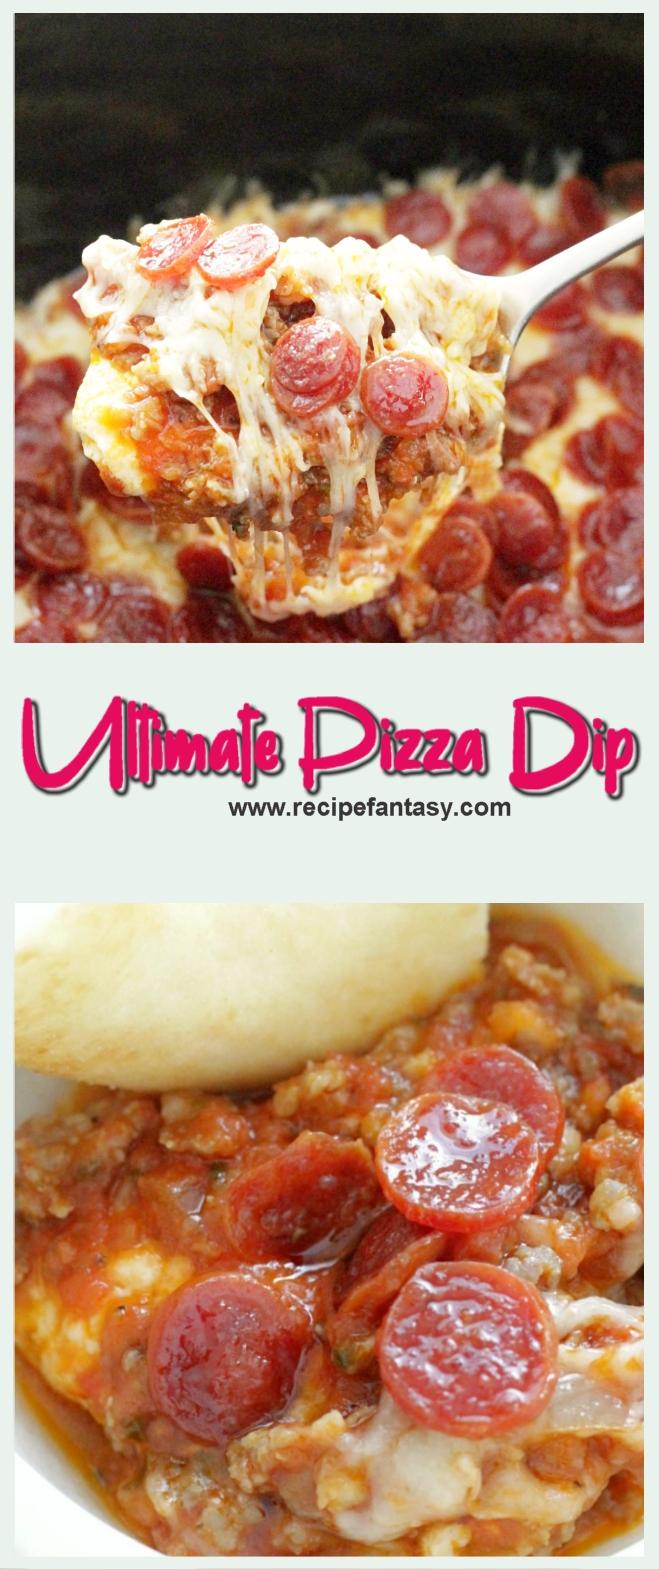 Ultimate Pizza Dip